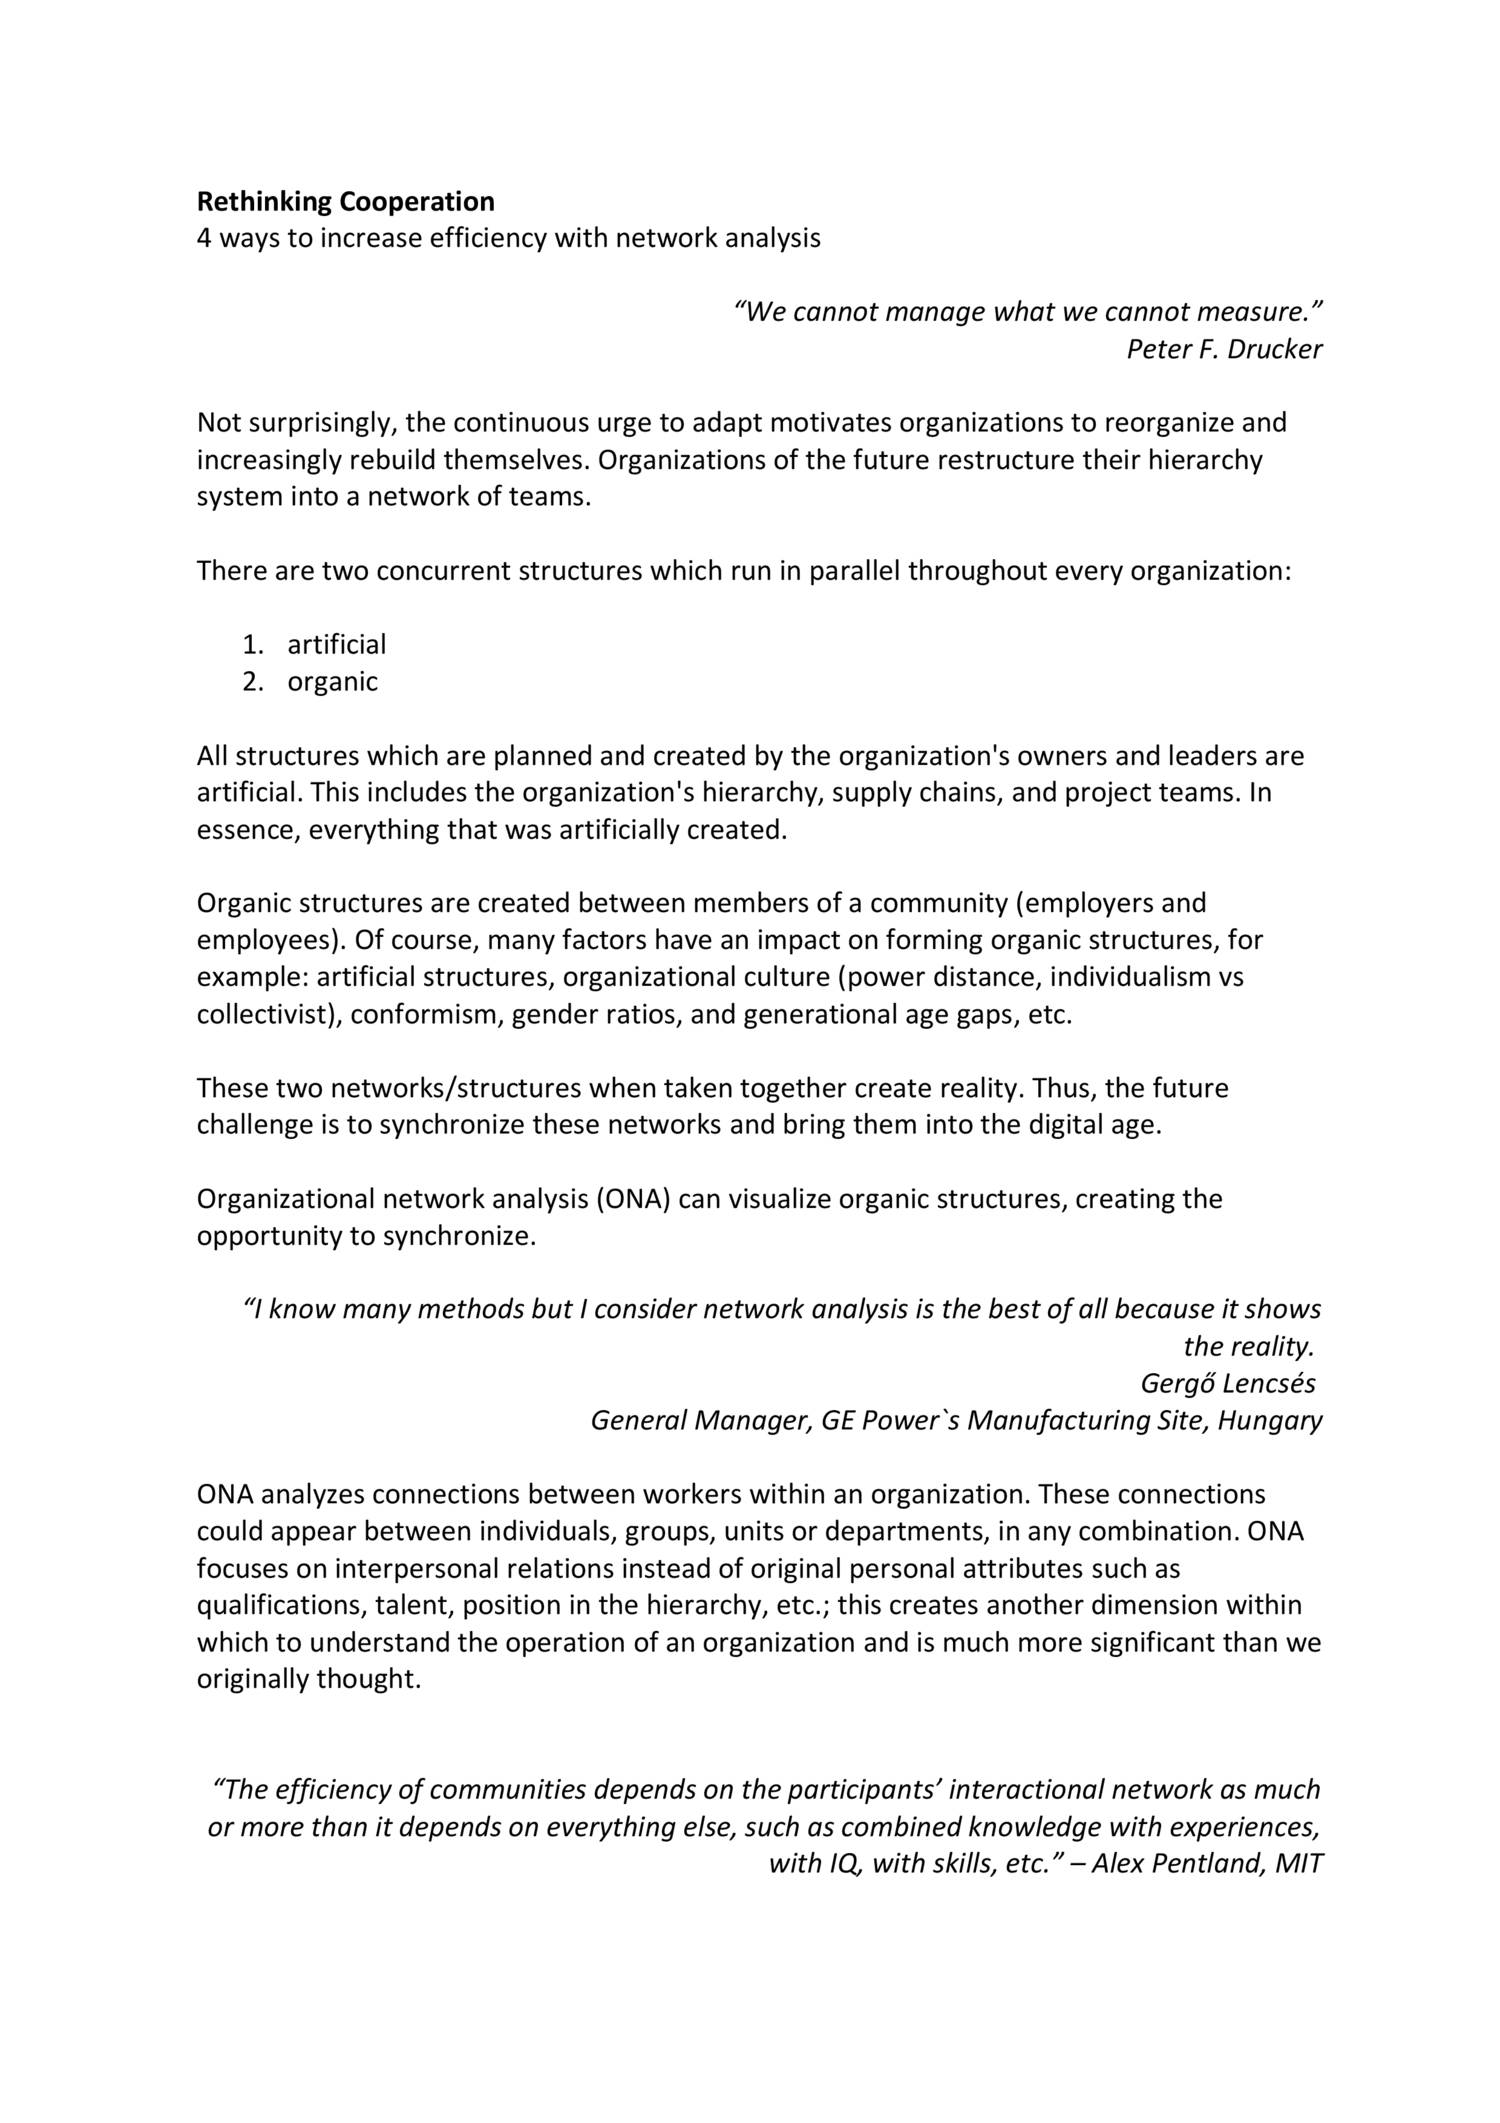 Organisational Network Analysis Efficiency pdf   DocDroid